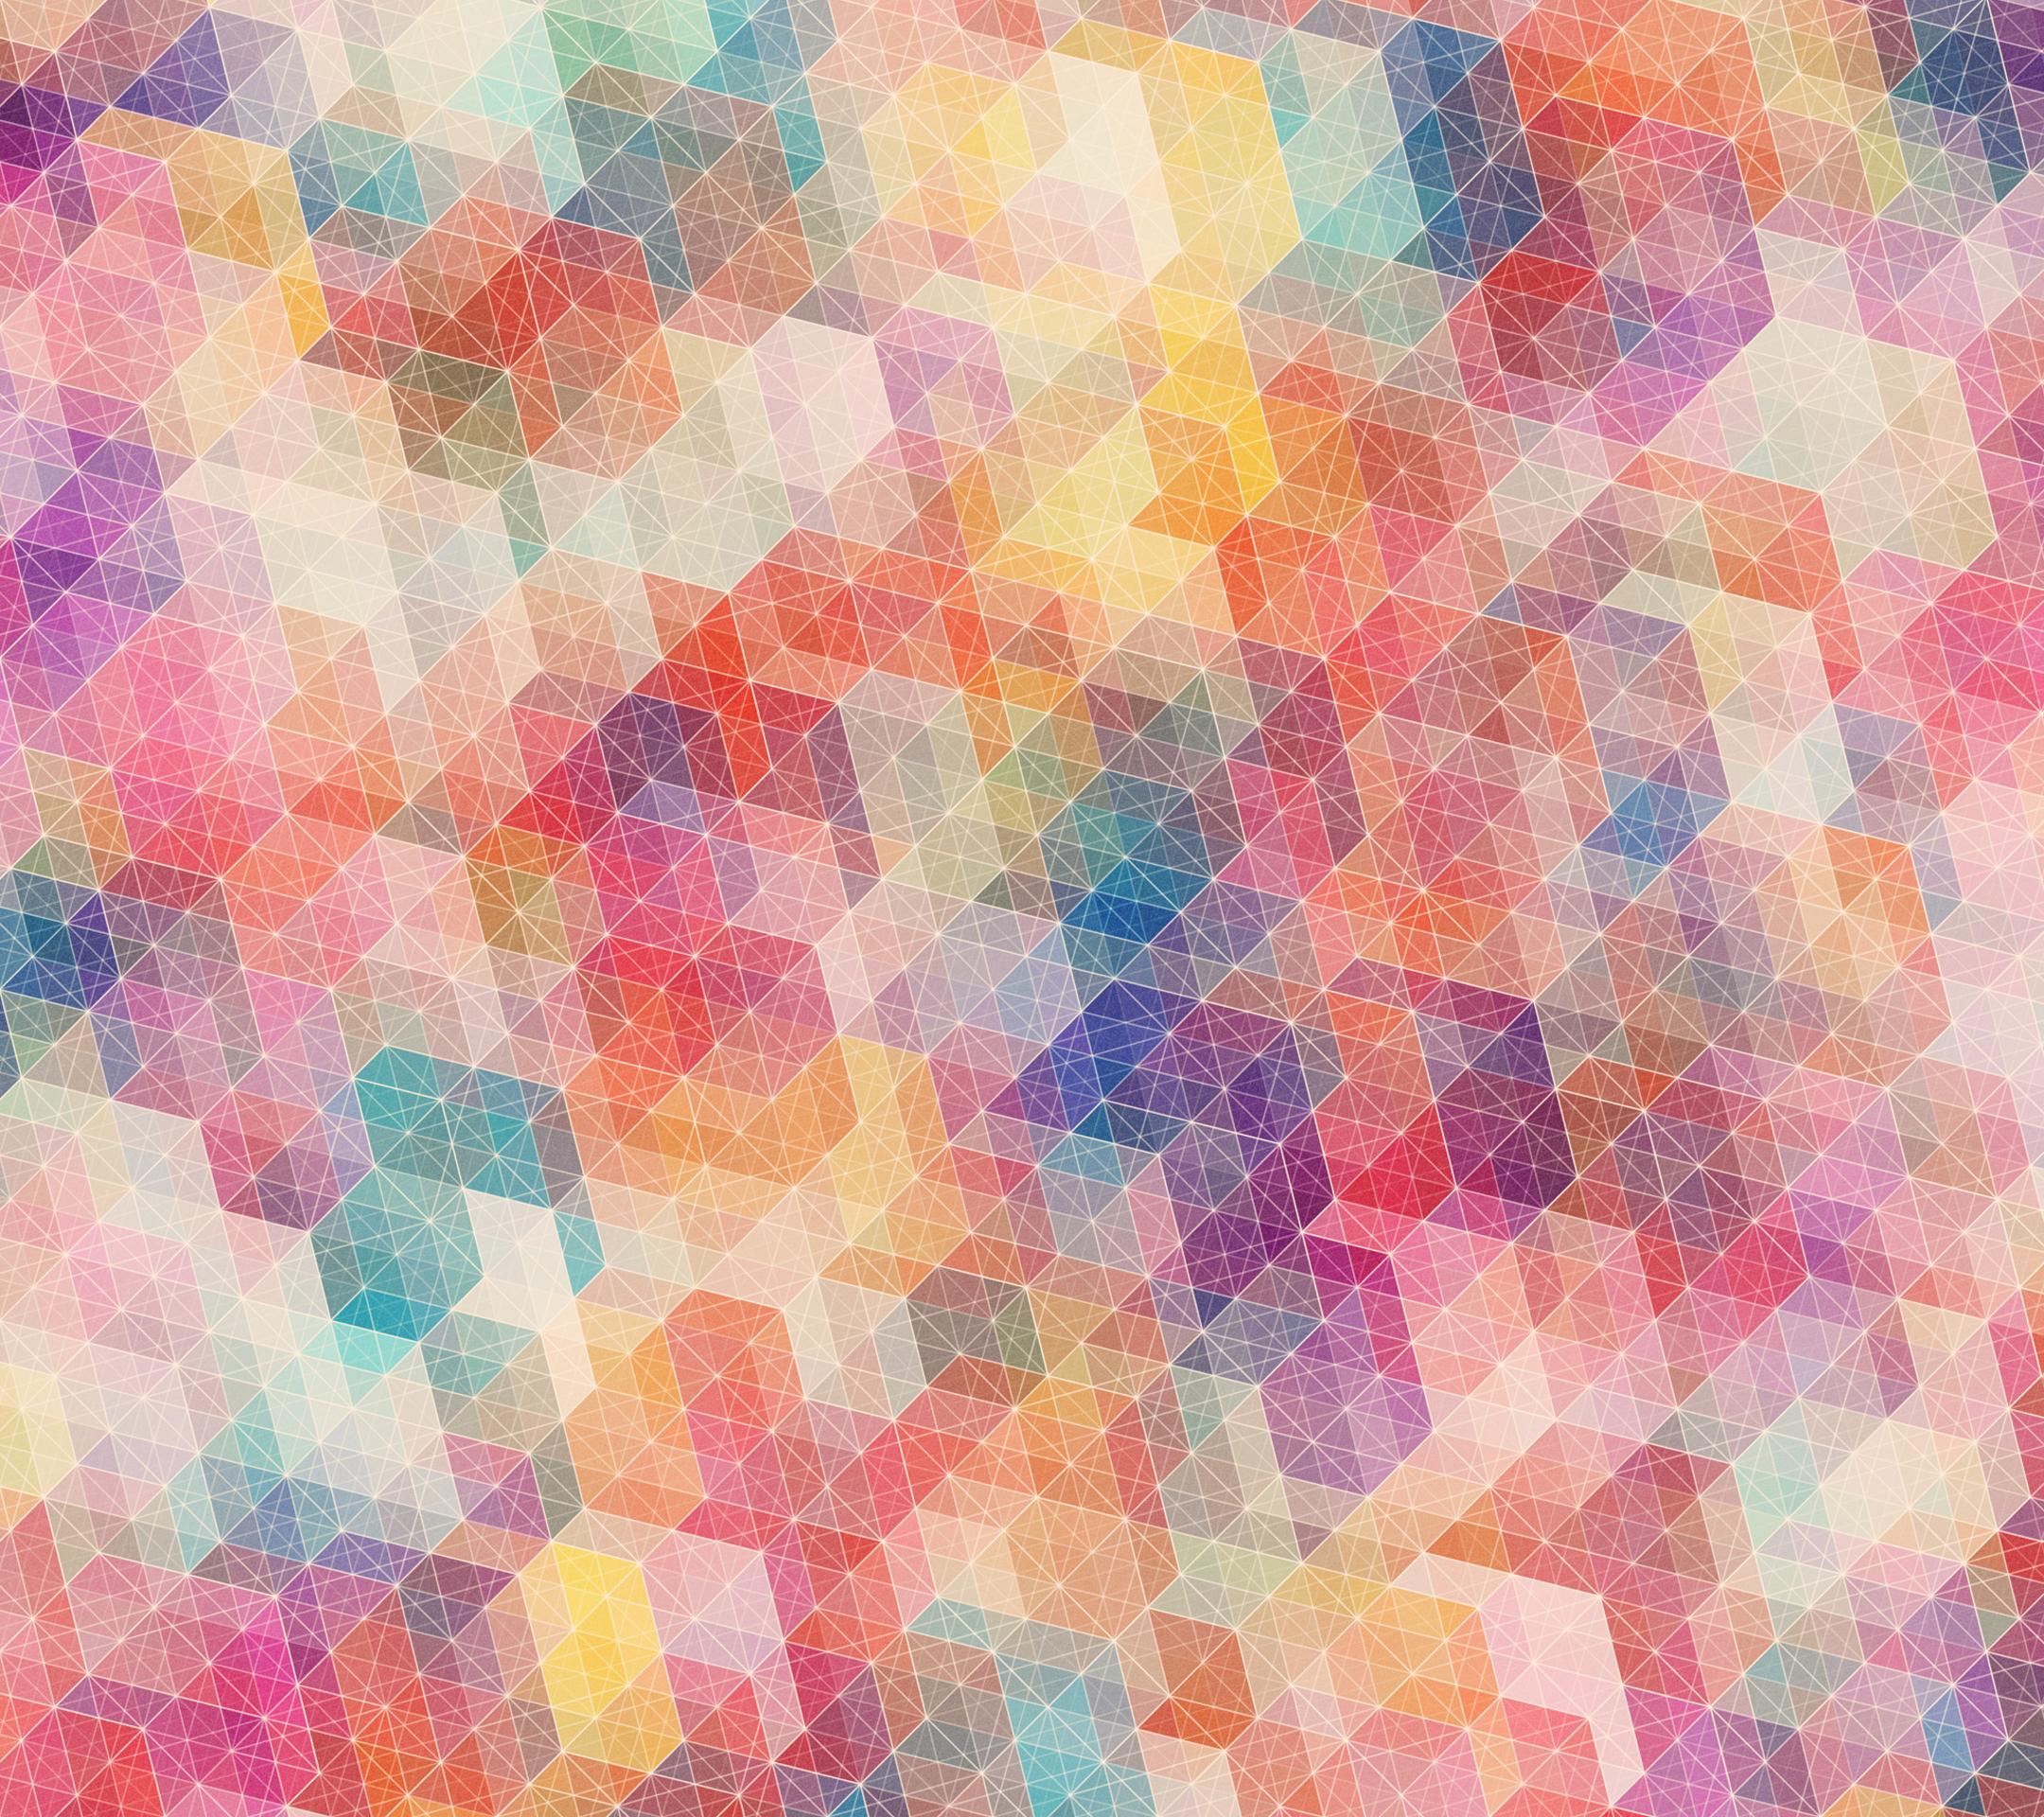 Group Of Galaxy Tumblr Wallpaper Designs